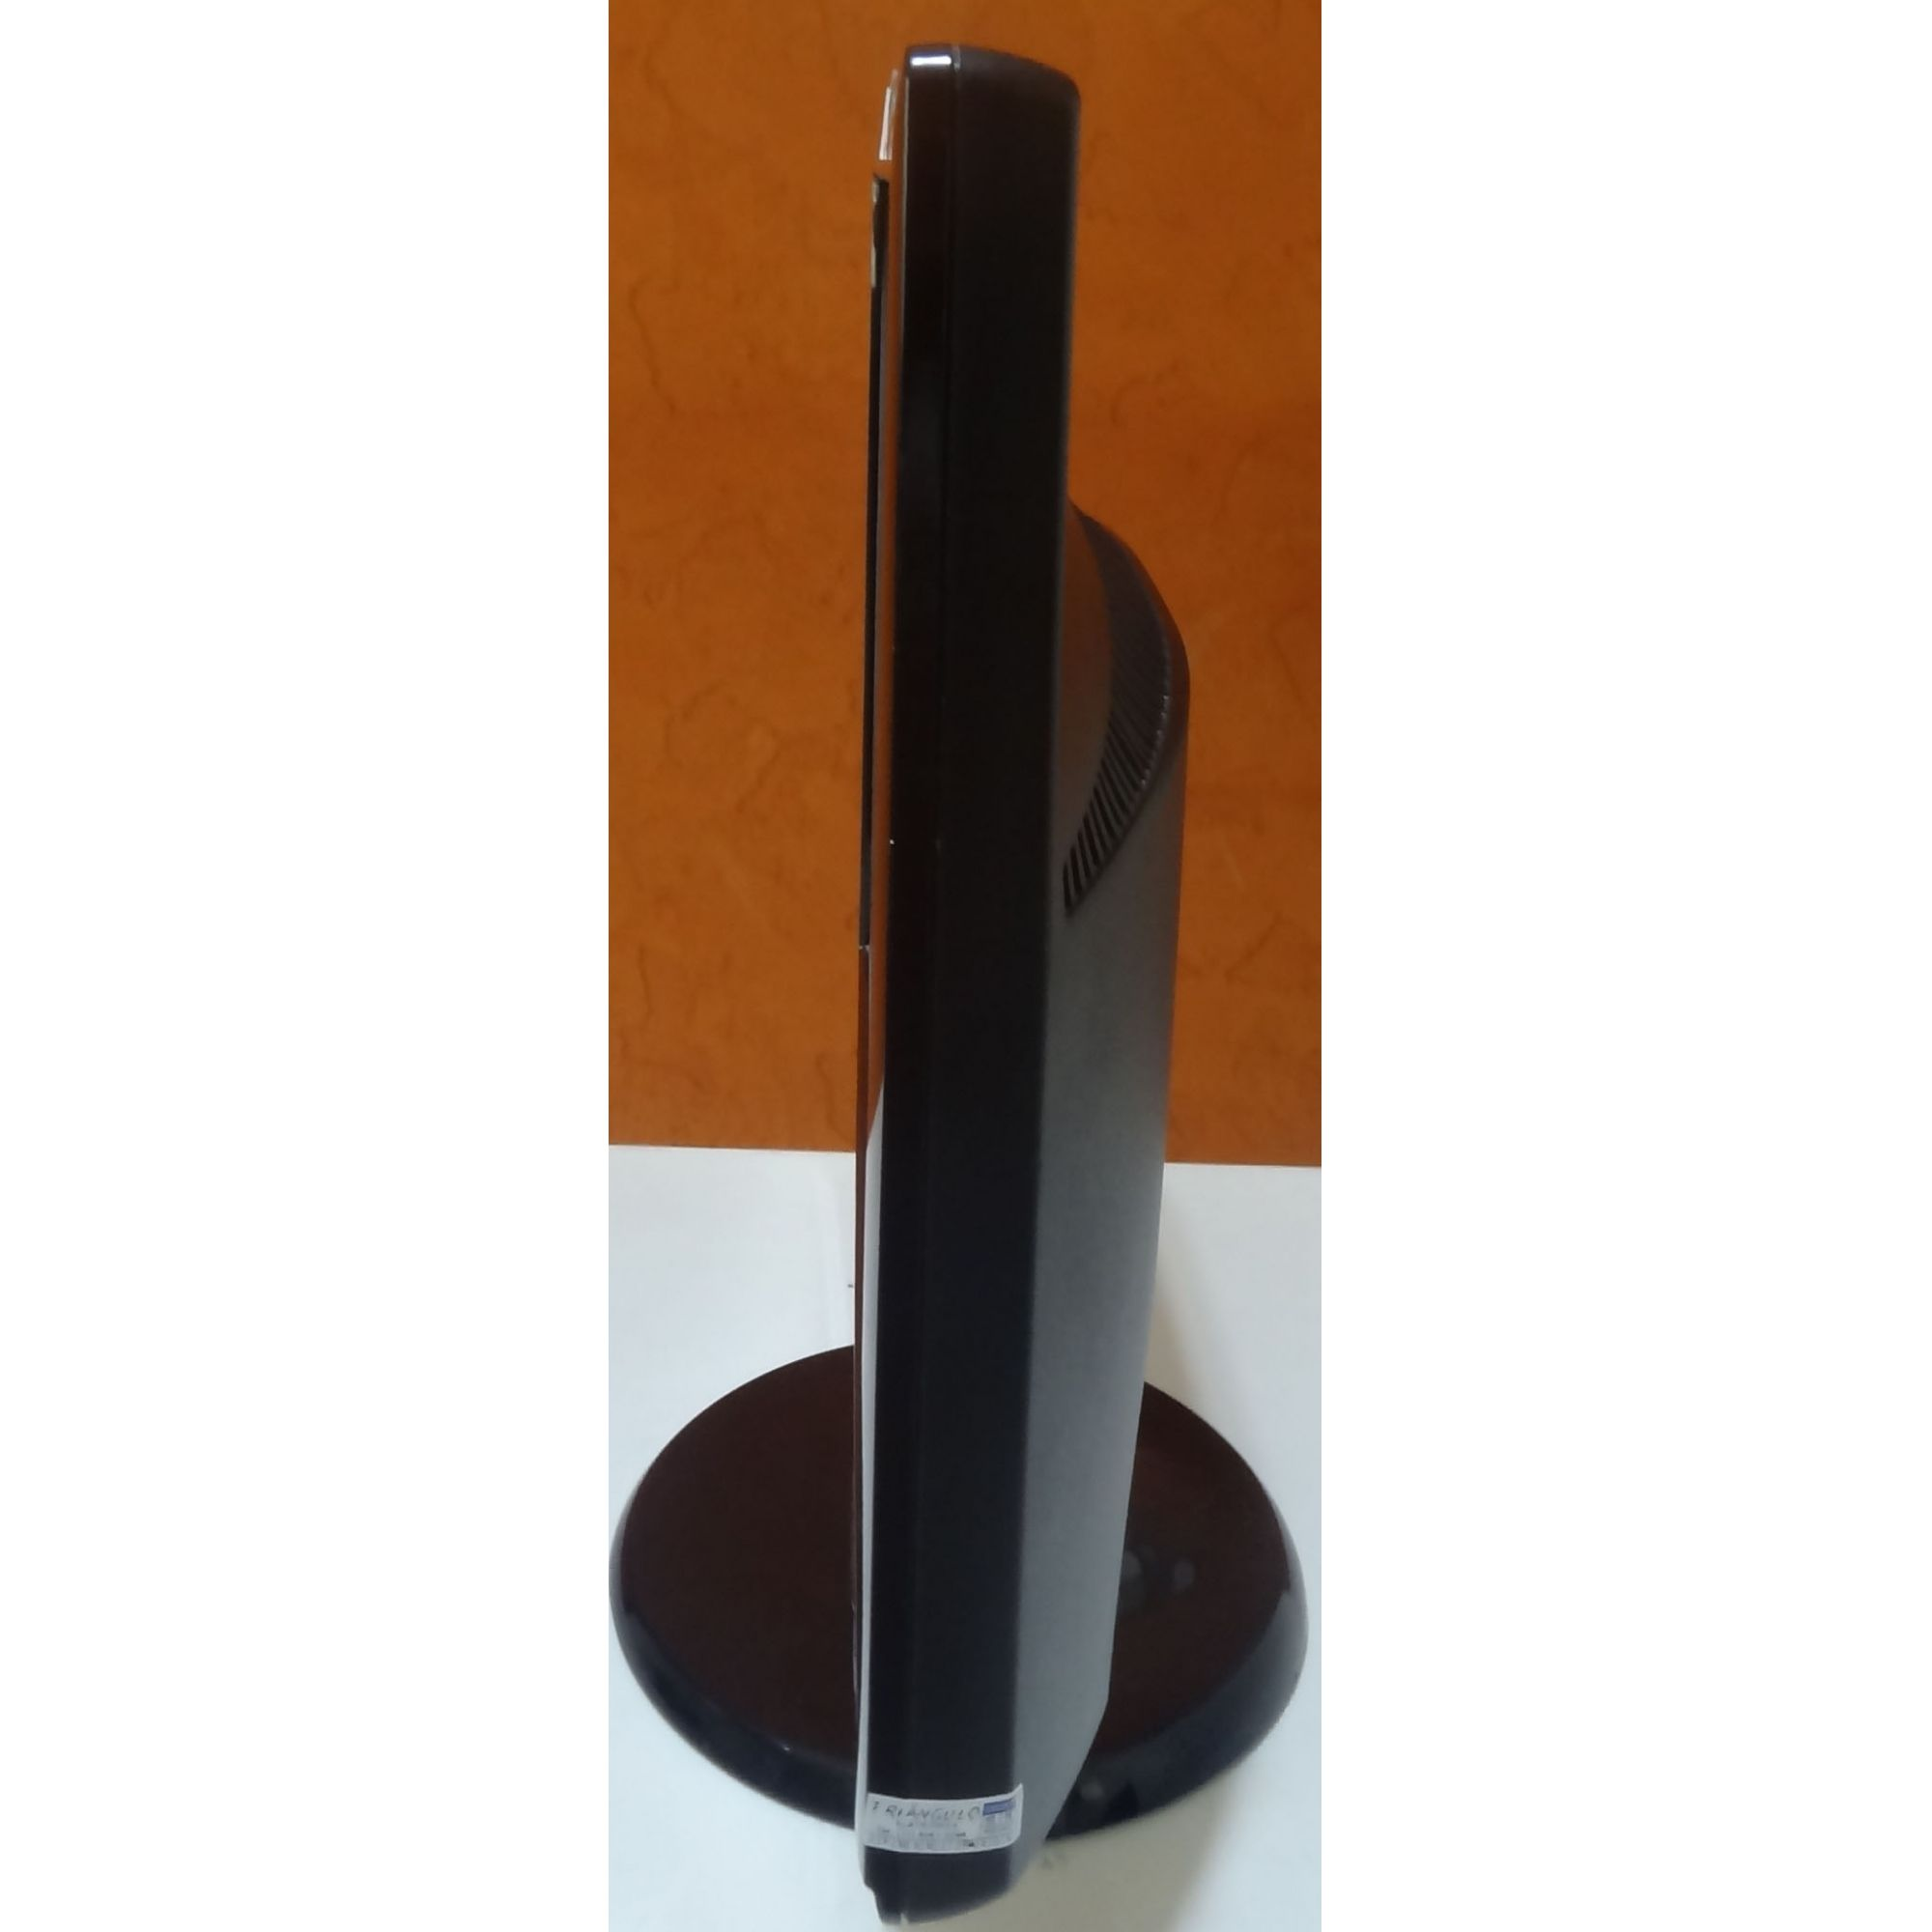 Monitor LG Flatron W2043S 20